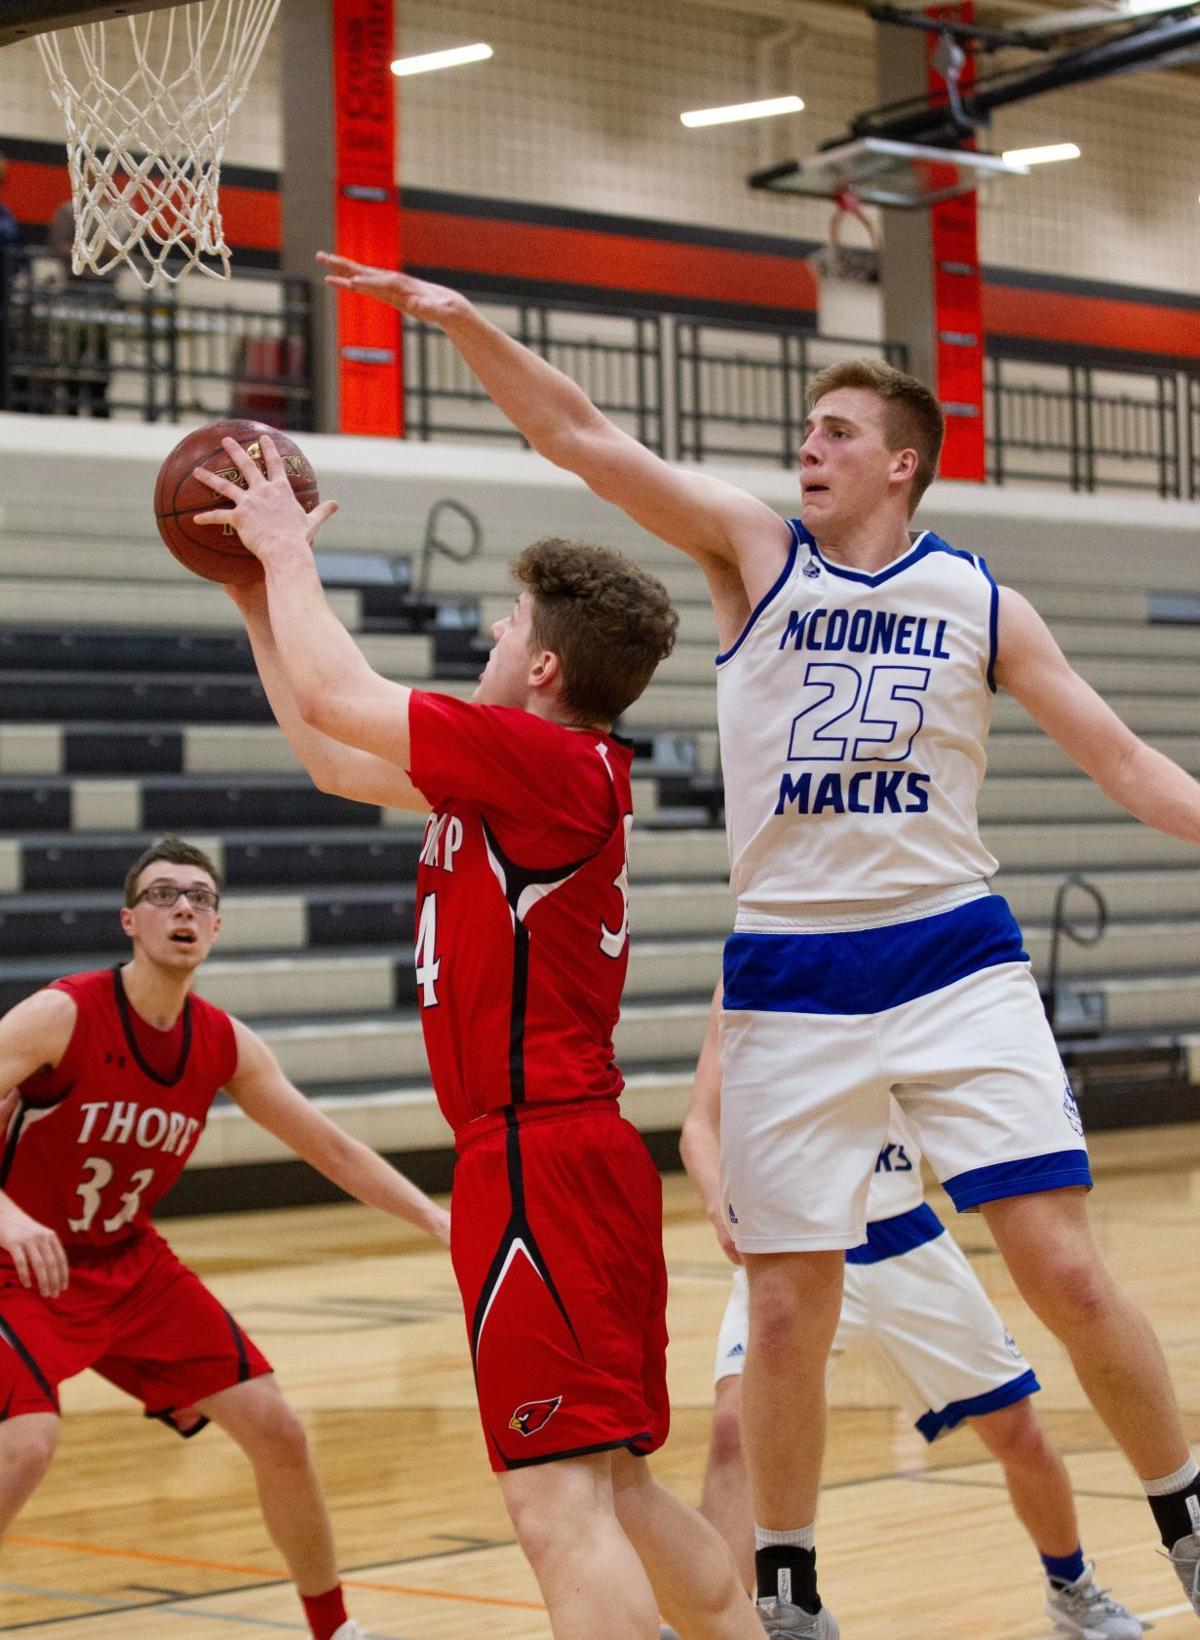 McDonell Thorp boys basketball